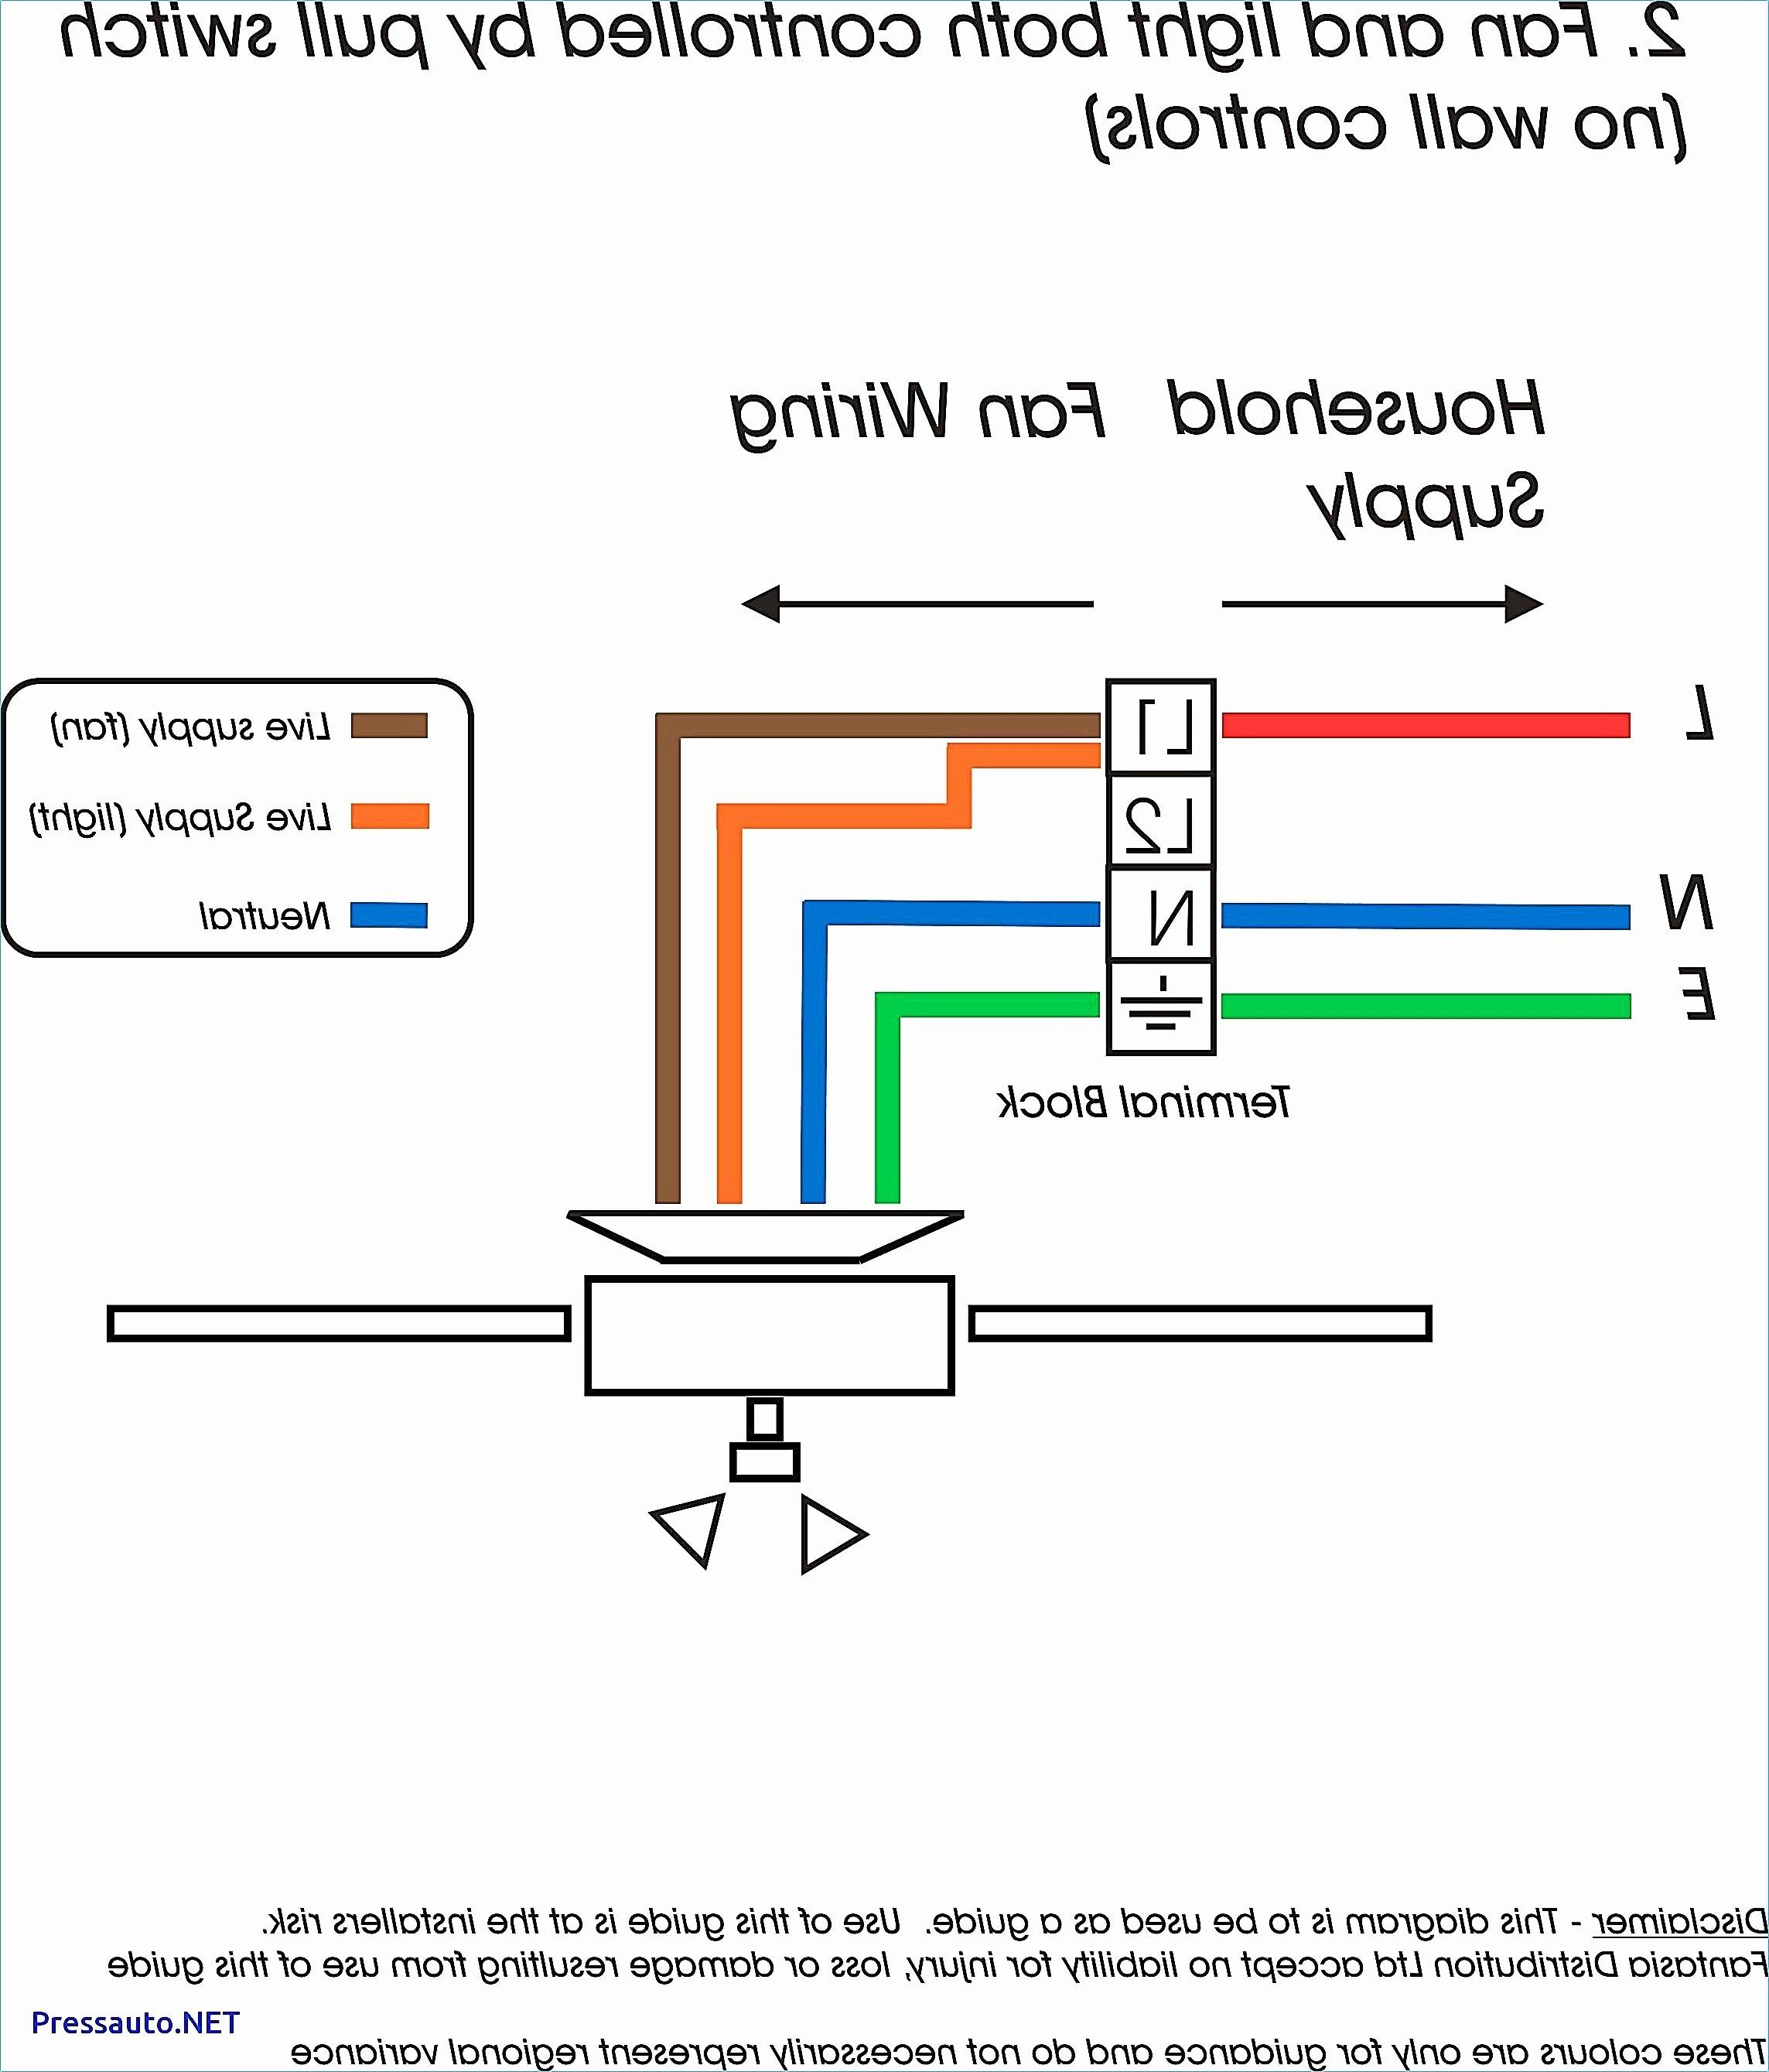 smart car wiring diagram Download-Smart Key Wiring Diagram New Wiring Diagram X1 9 Archives Joescablecar Best Wiring 4-j